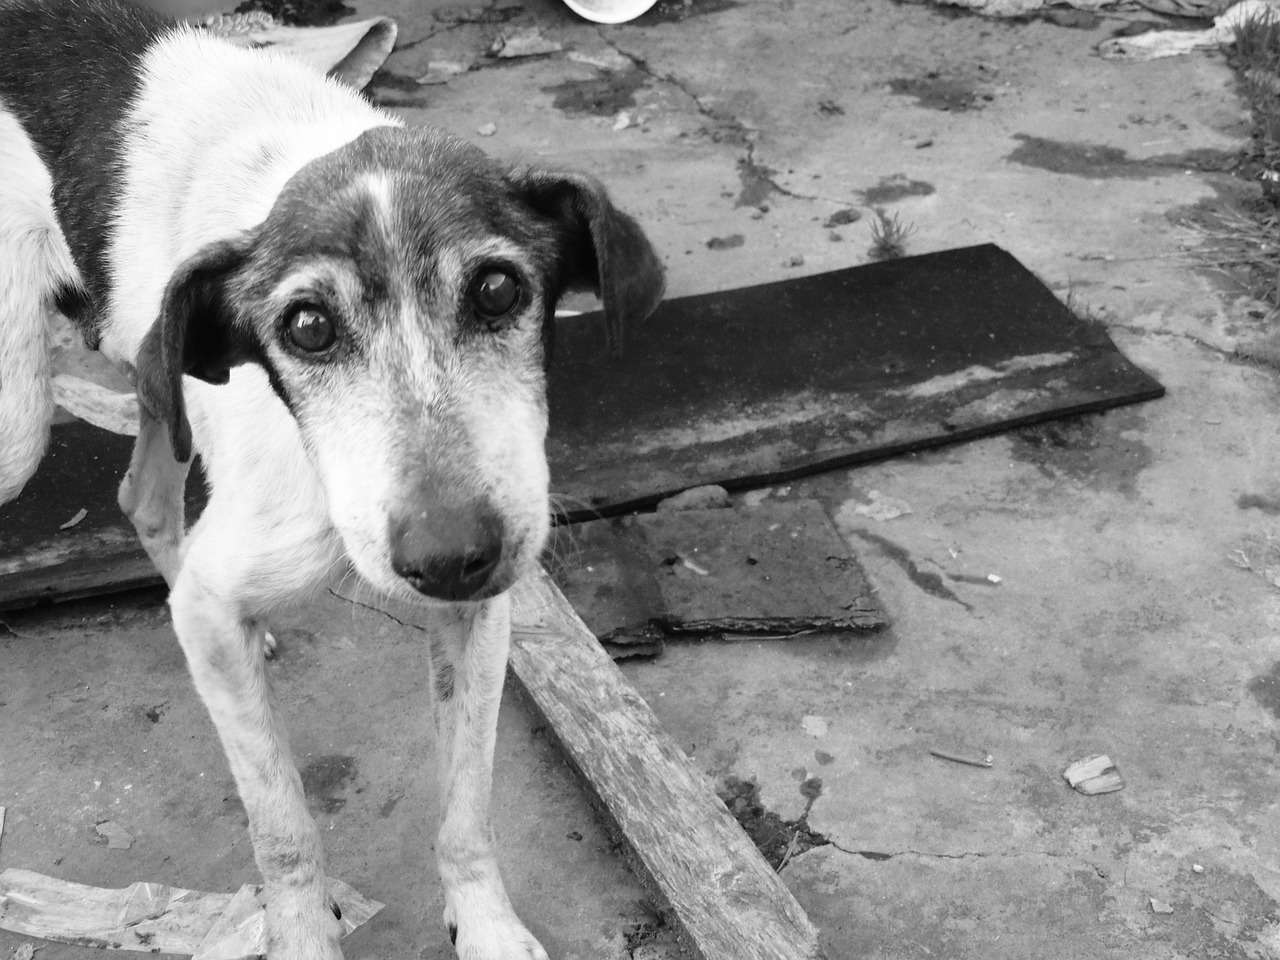 Cani randagi: le ultime stime parlano di oltre 700mila unità